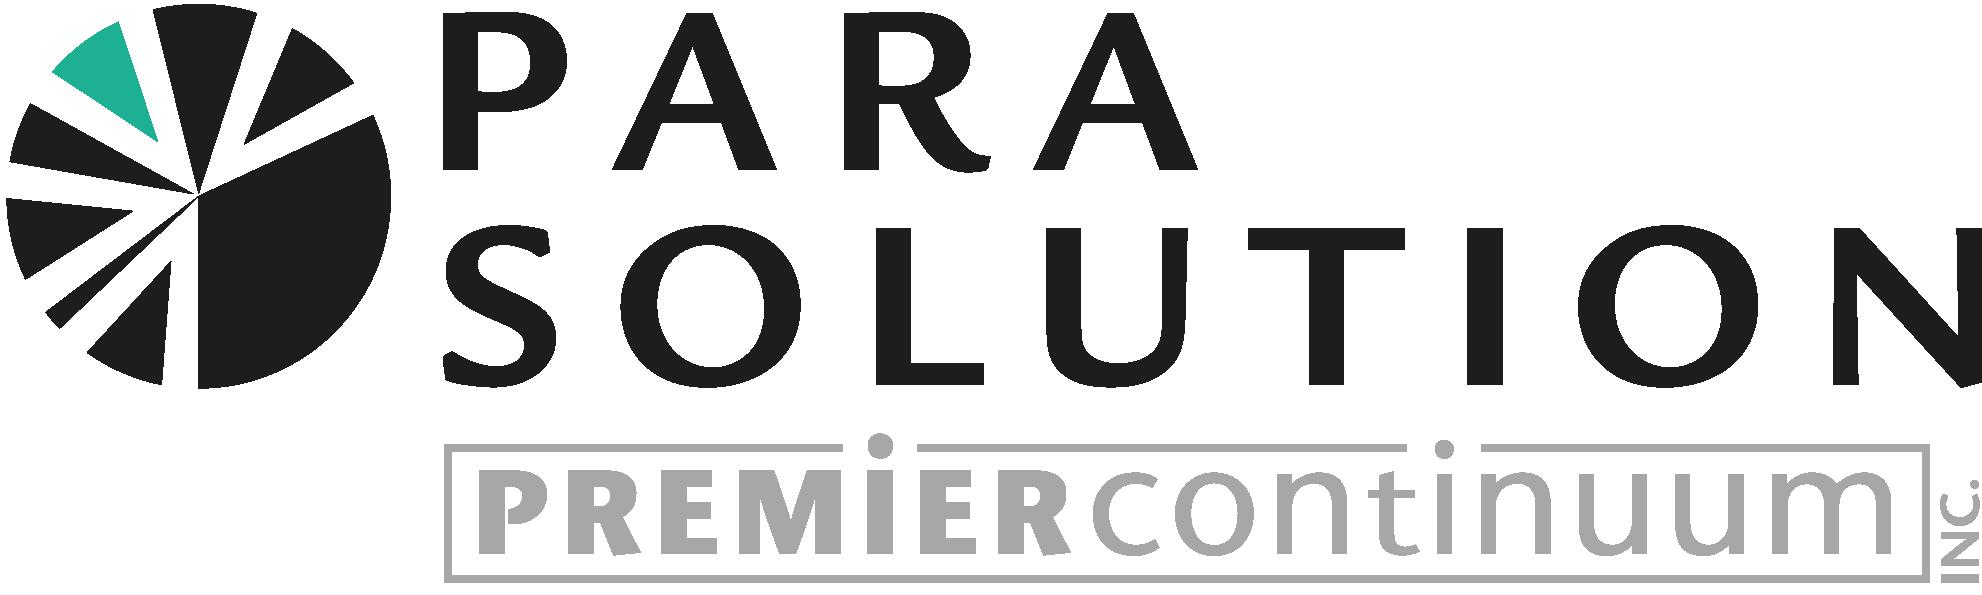 ParaSolution logo